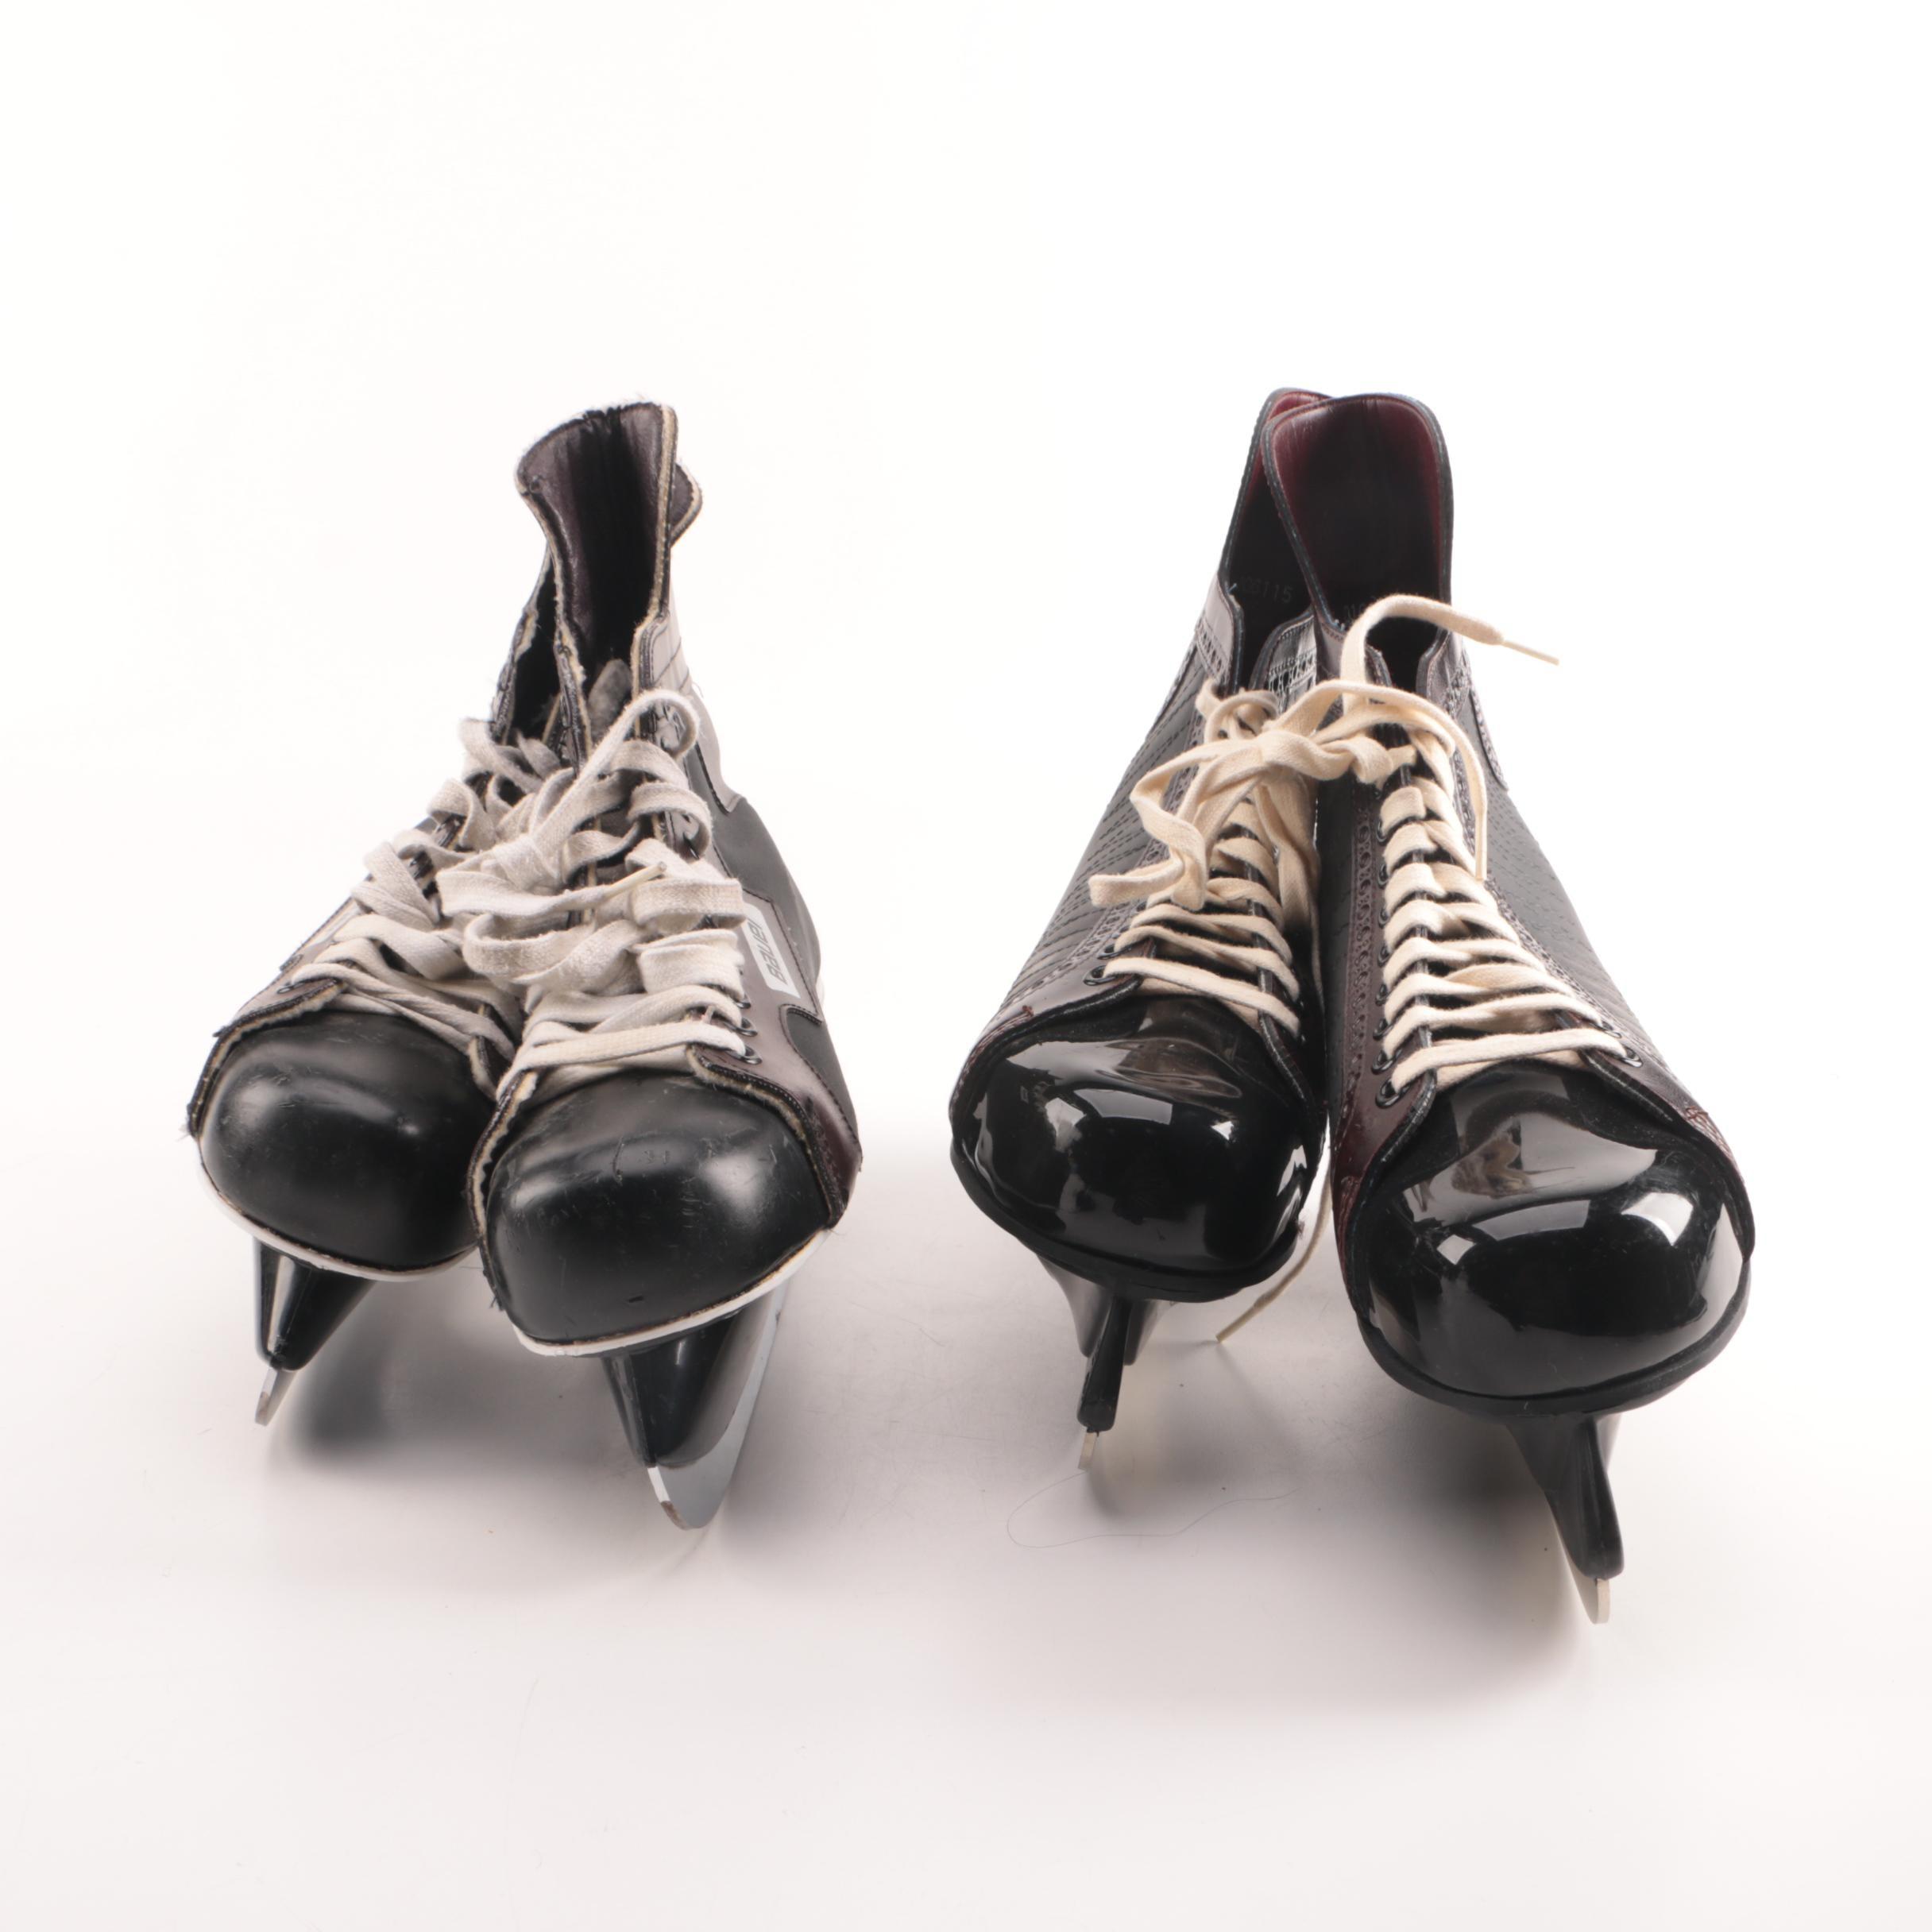 Hockey Ice Skates, Including Bauer